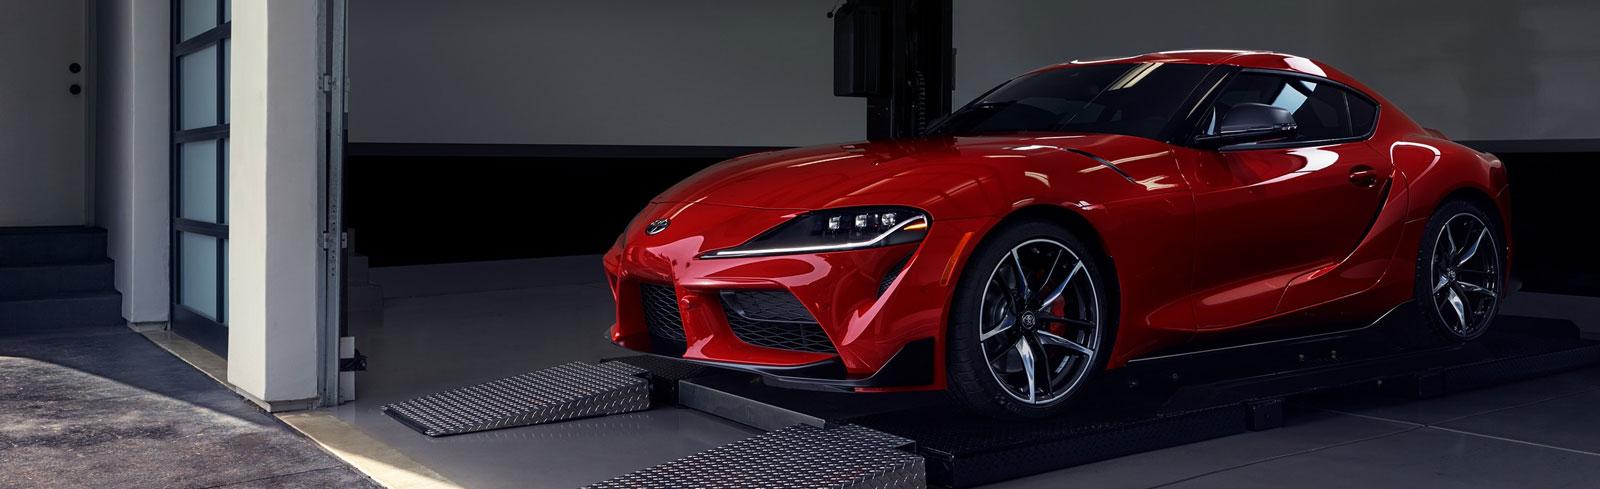 2020 Toyota GR Supra Sports Car in Oklahoma City, near Edmond, OK